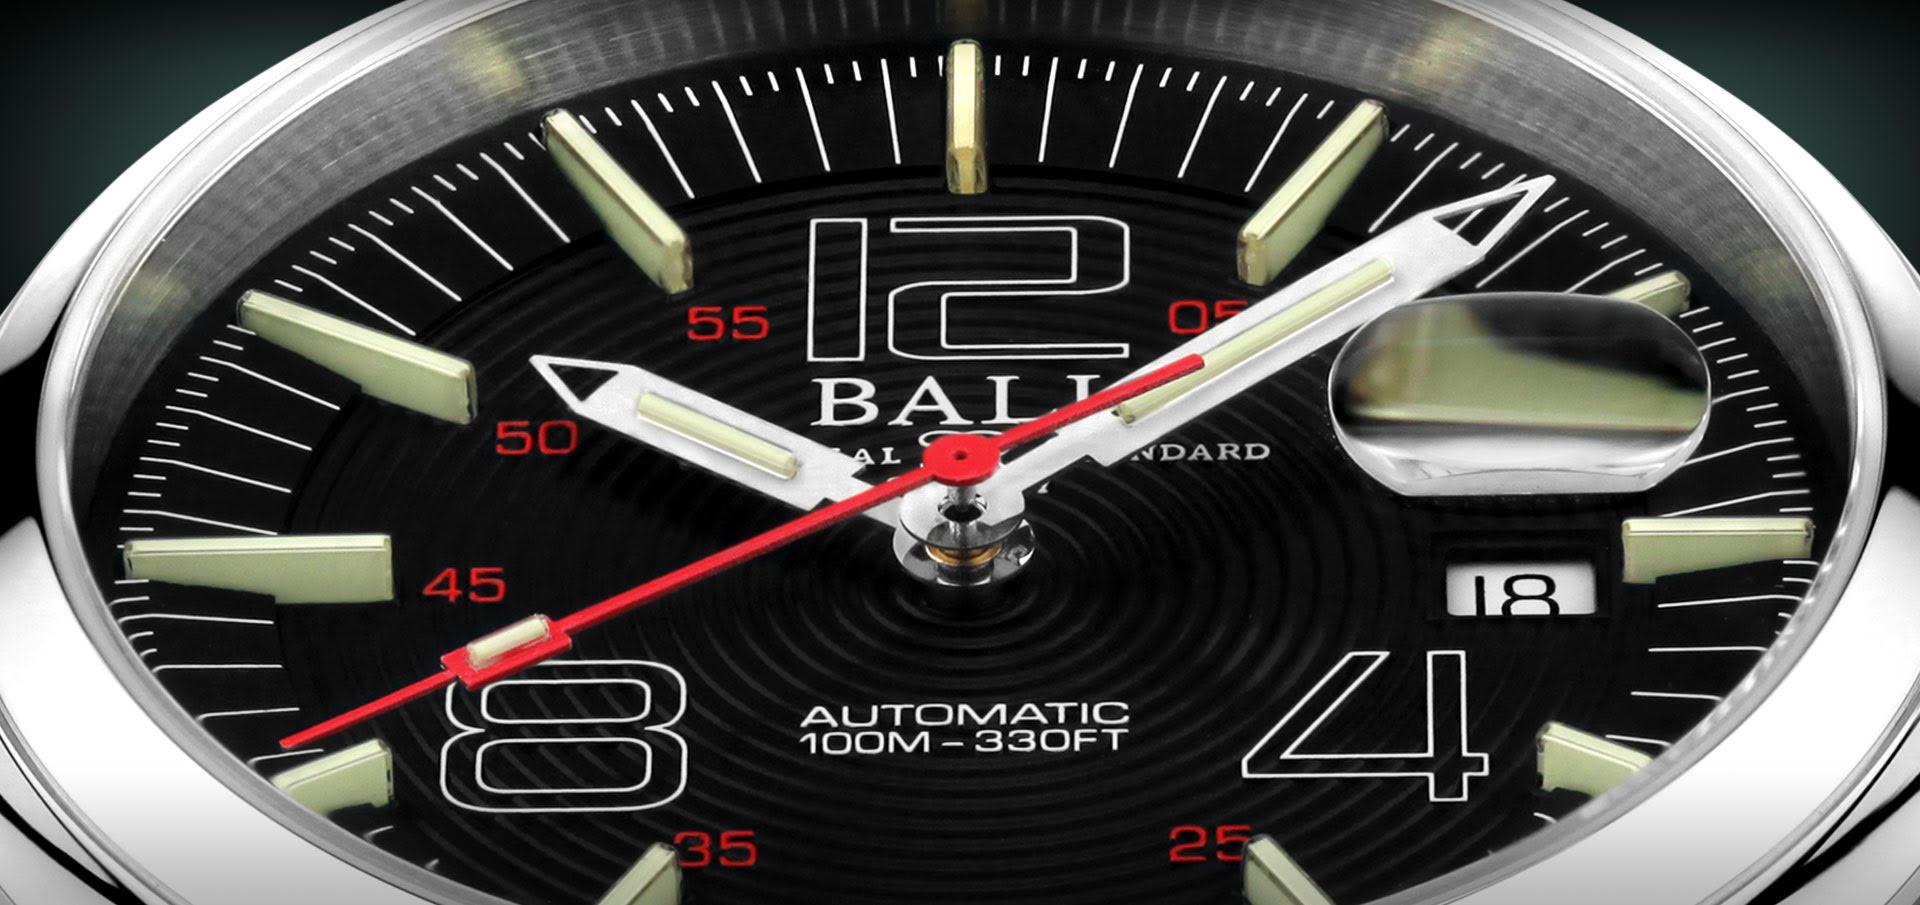 ball-fireman-nightbreaker-1.jpg